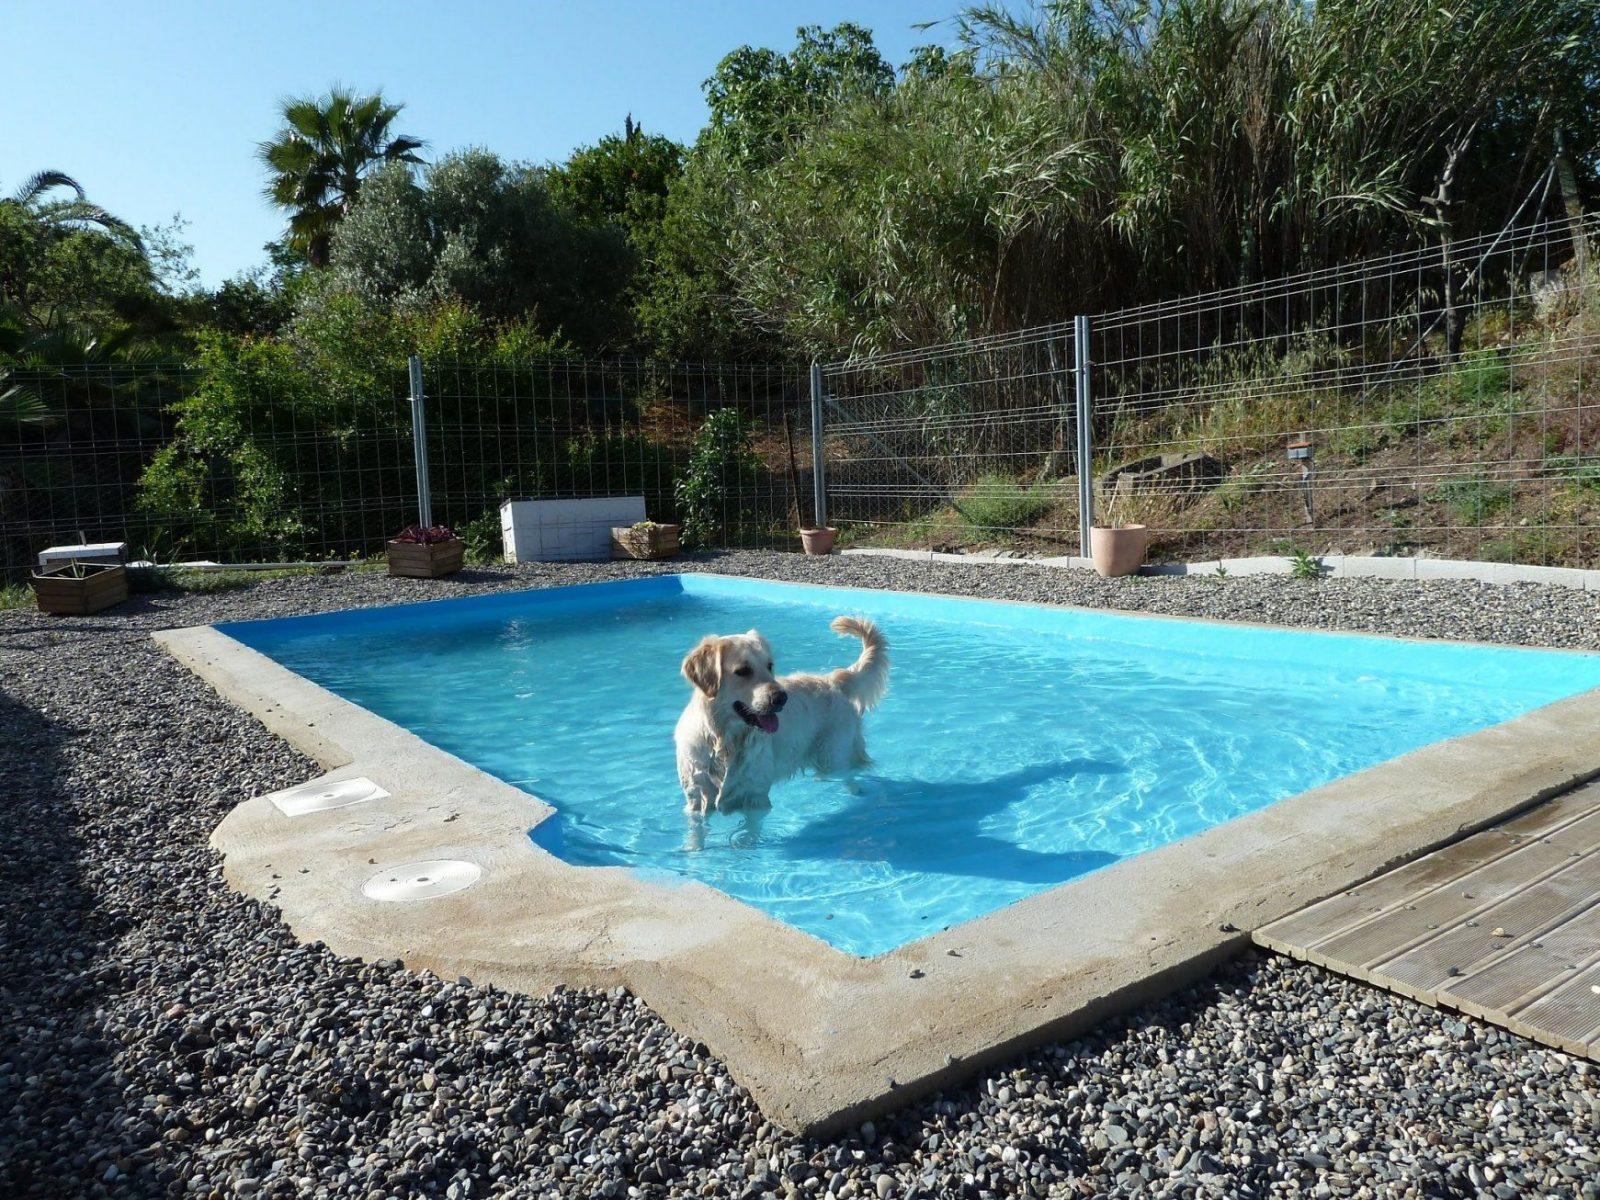 Hunde Pool Selber Bauen Atemberaubend Auf Kreative Deko Ideen In von Hunde Pool Selber Bauen Bild